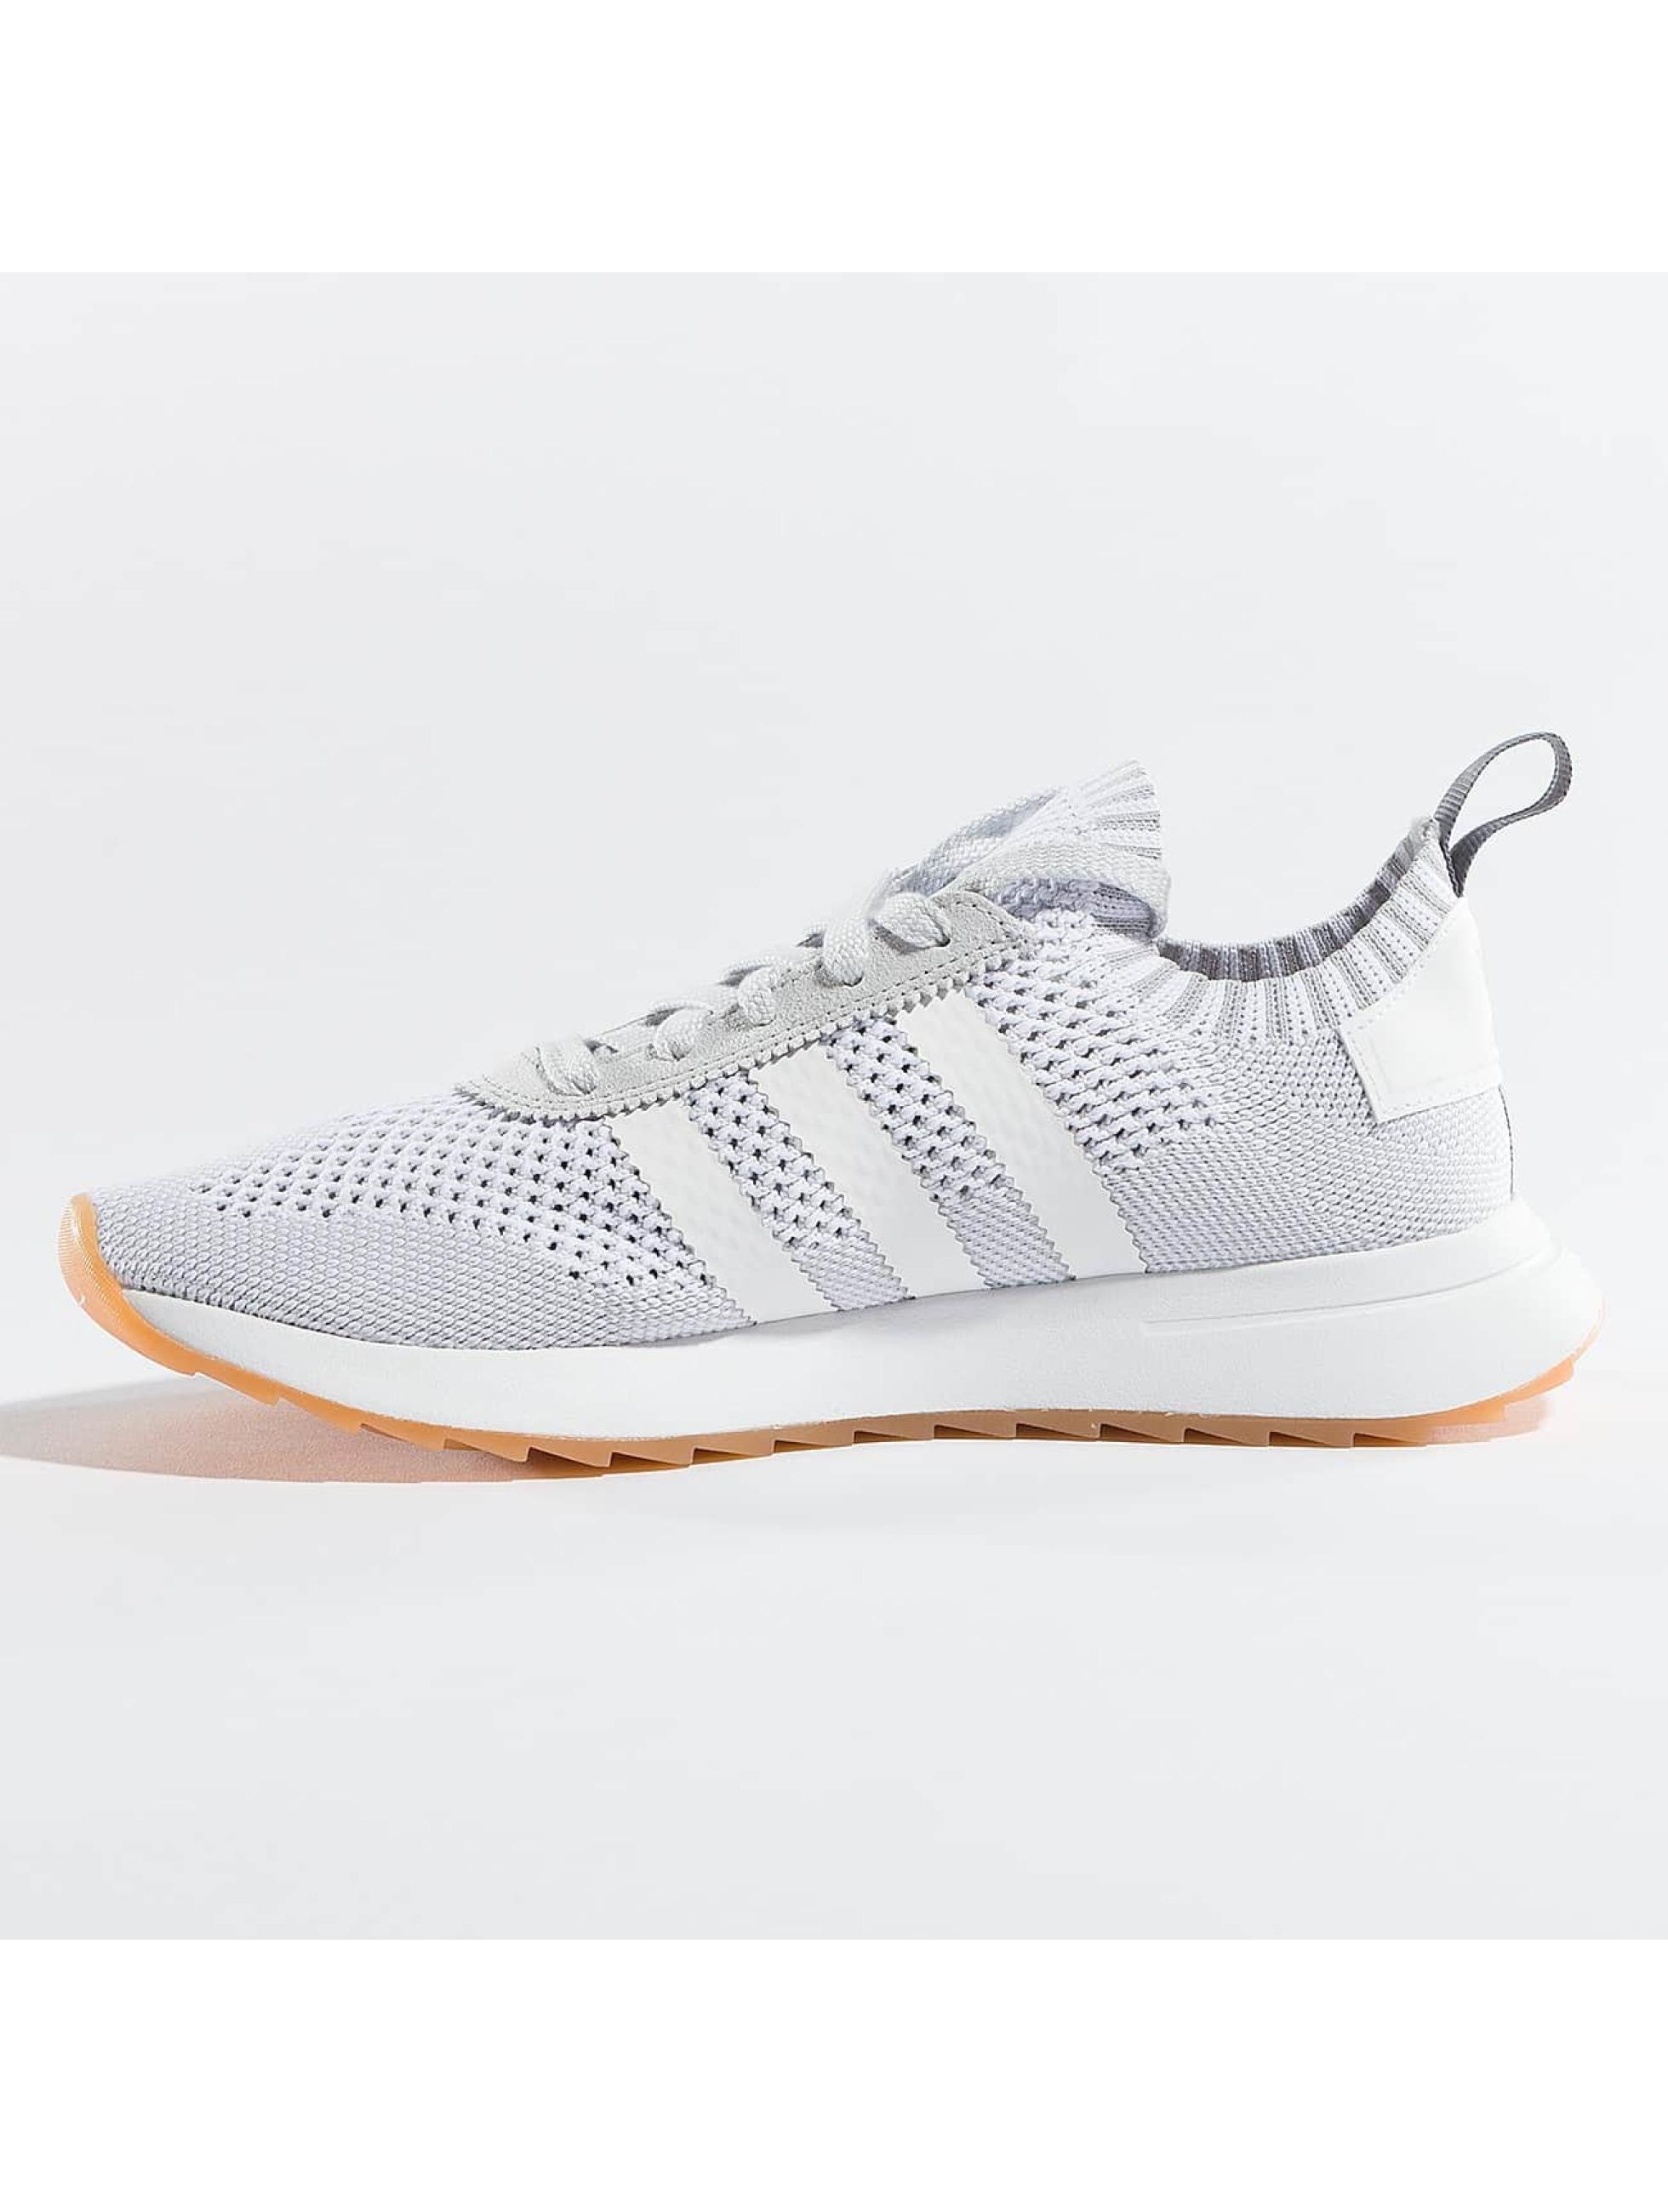 adidas Сникеры FLB W PK белый